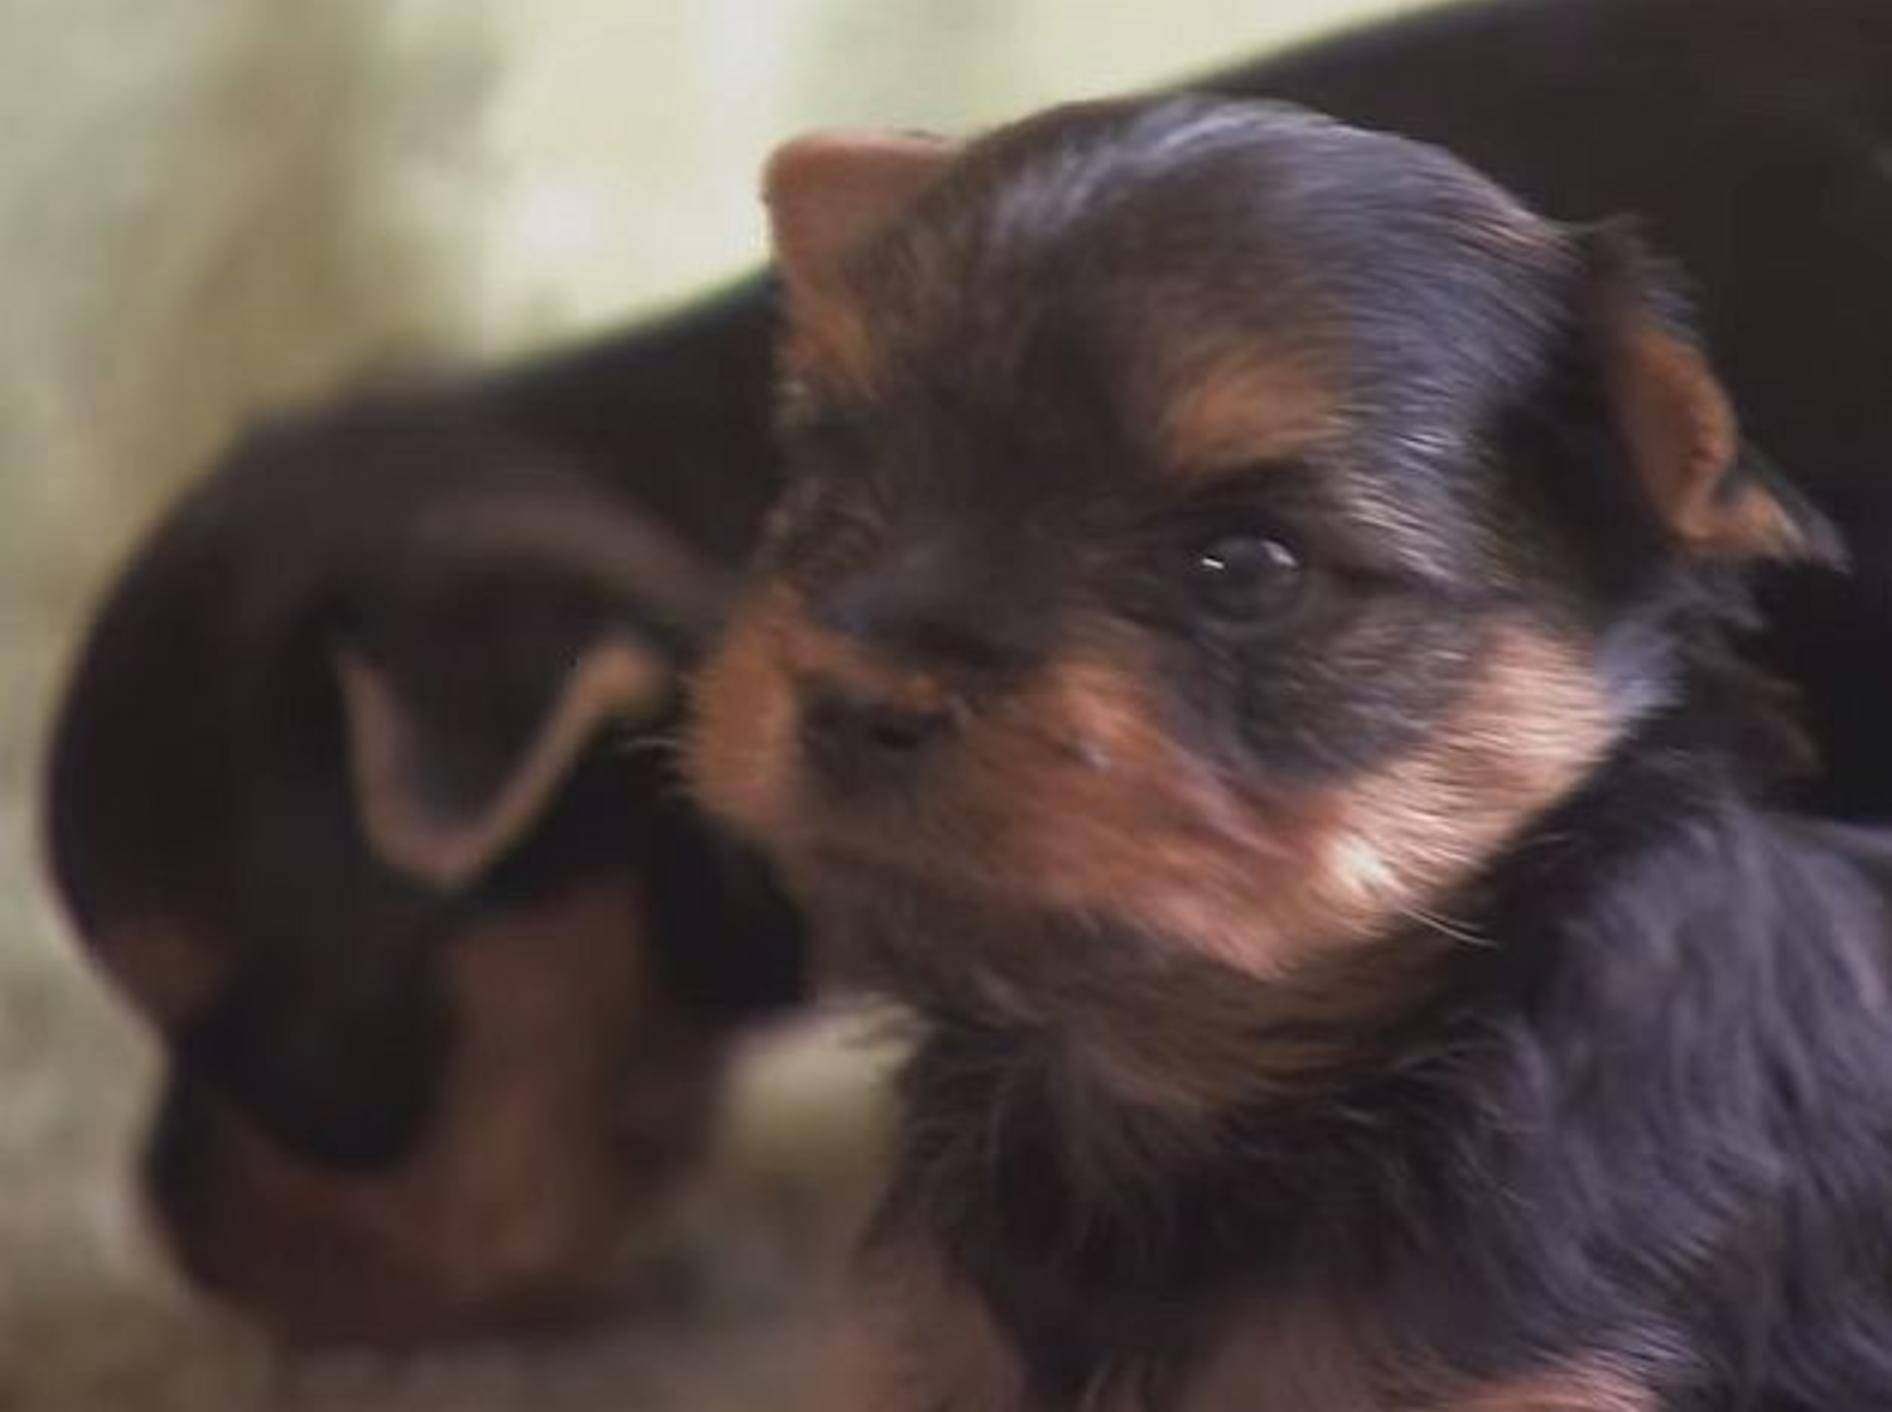 Terrier-Welpen: Klein aber oho – Bild: Youtube / Animal Planet